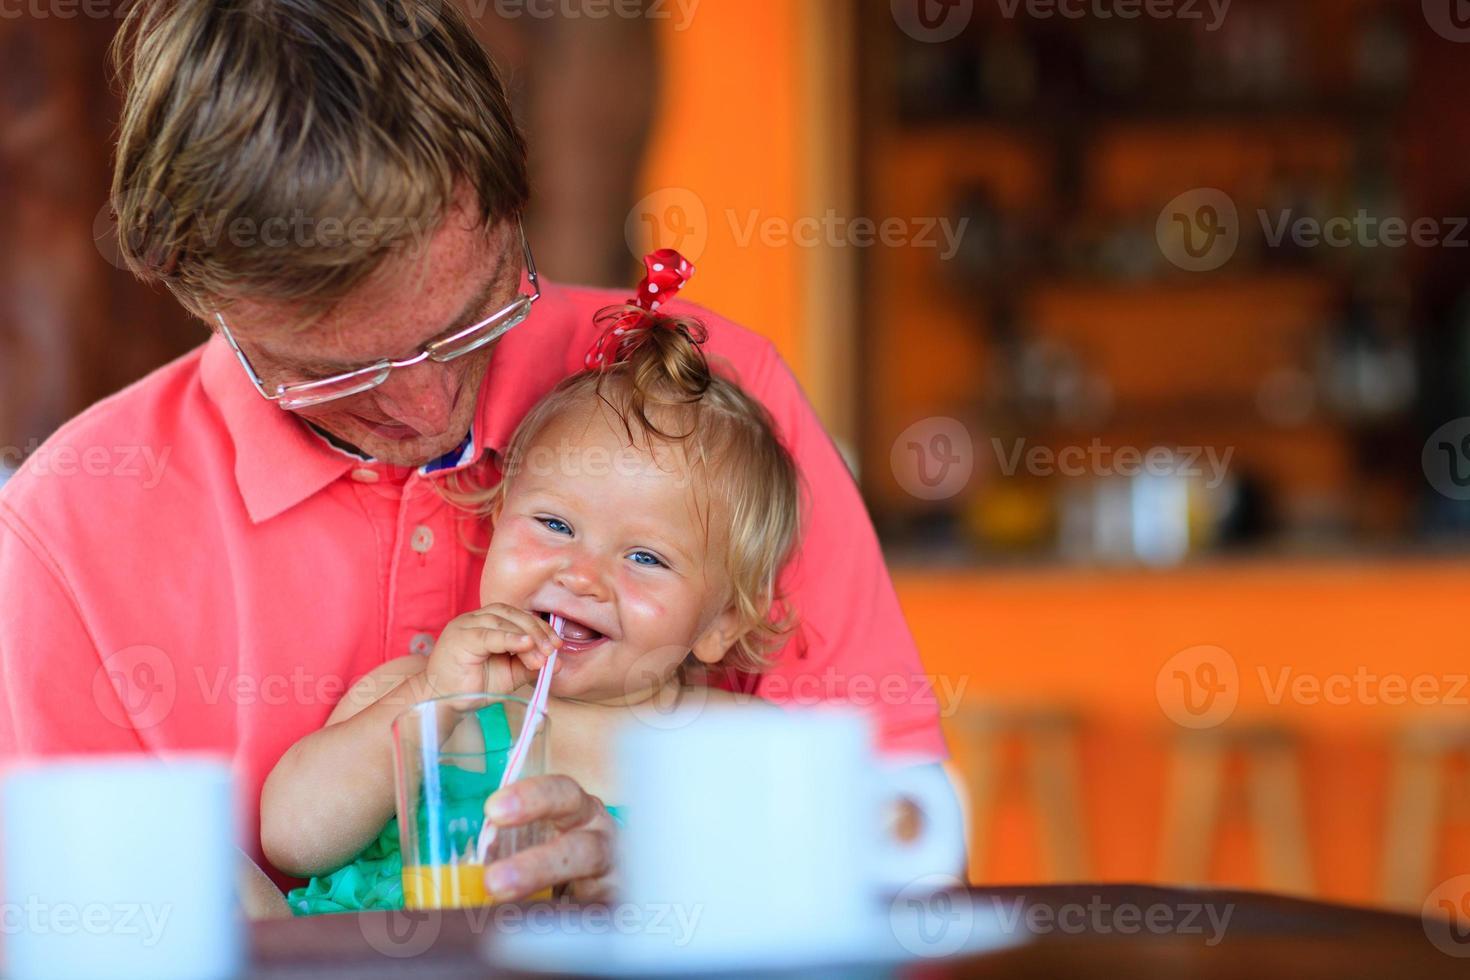 padre e hija tomando una copa en el café foto